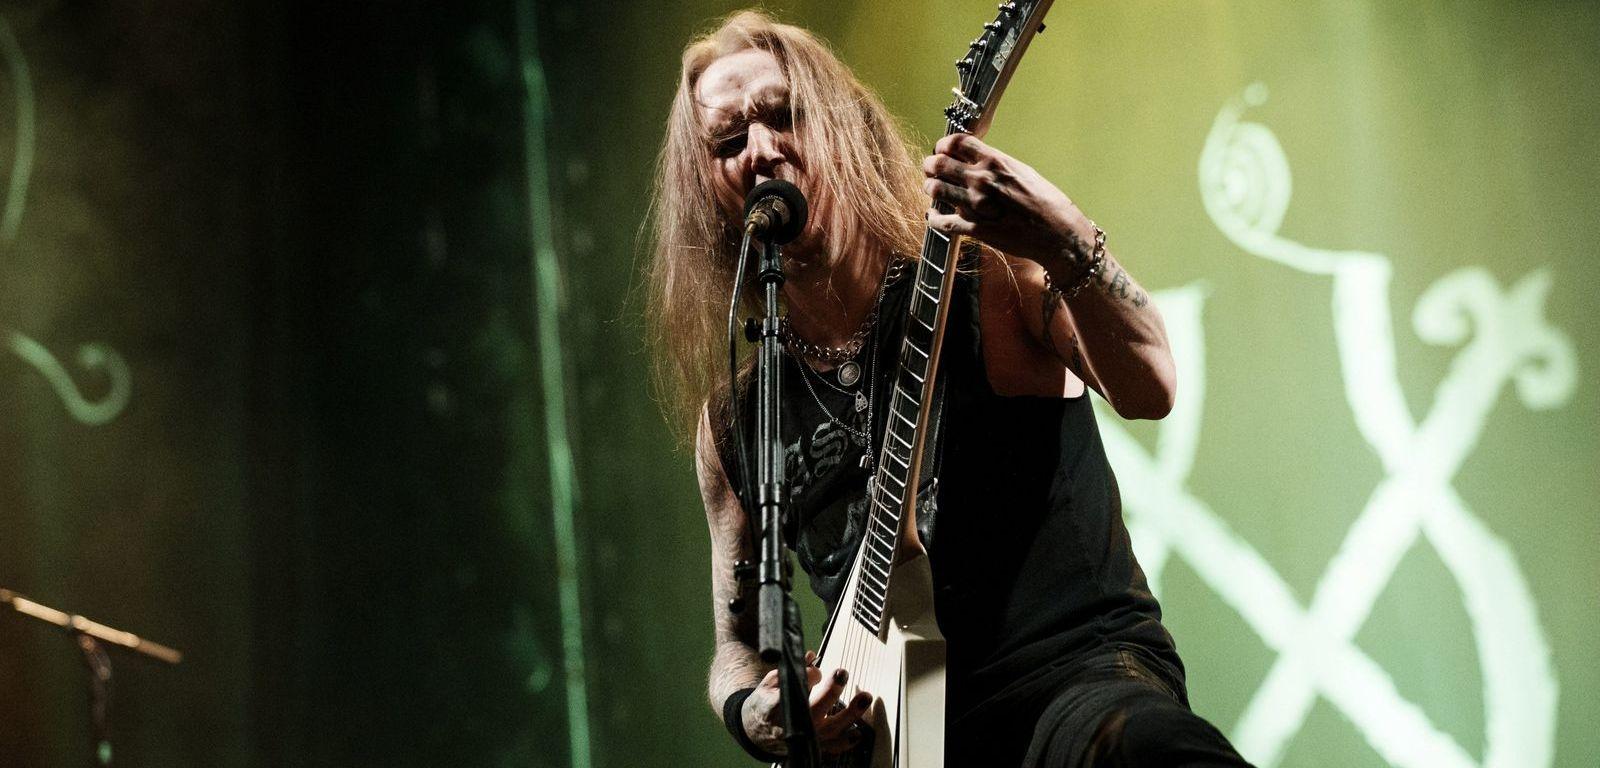 S-a aflat cauza morții lui Alexi Laiho de la Children of Bodom